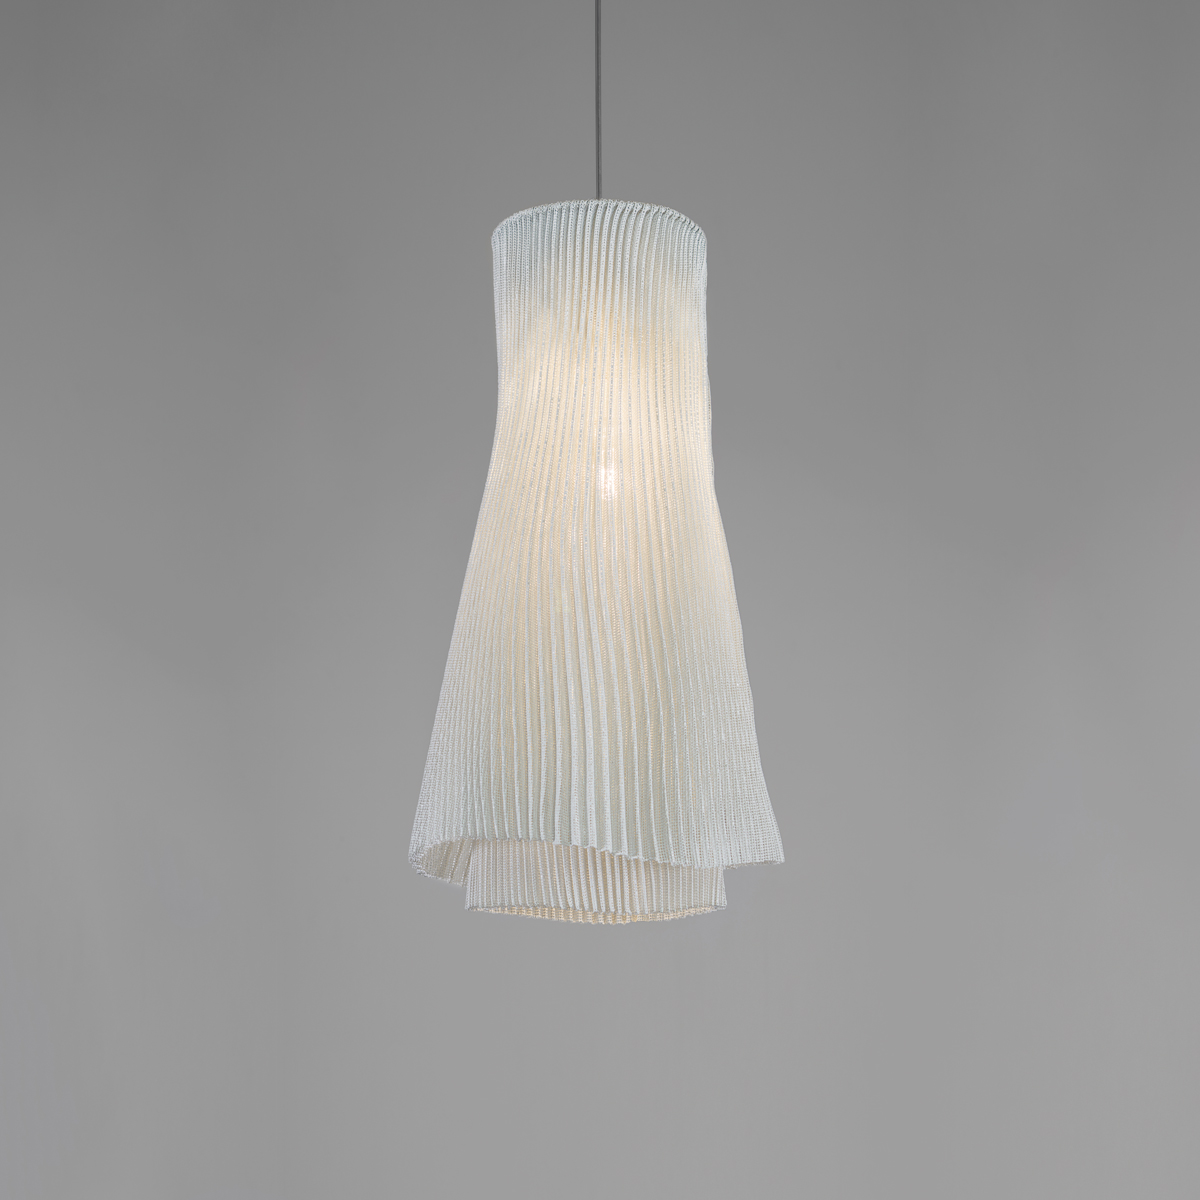 arturo alvarez Tempo Andante handmade pendant lamp